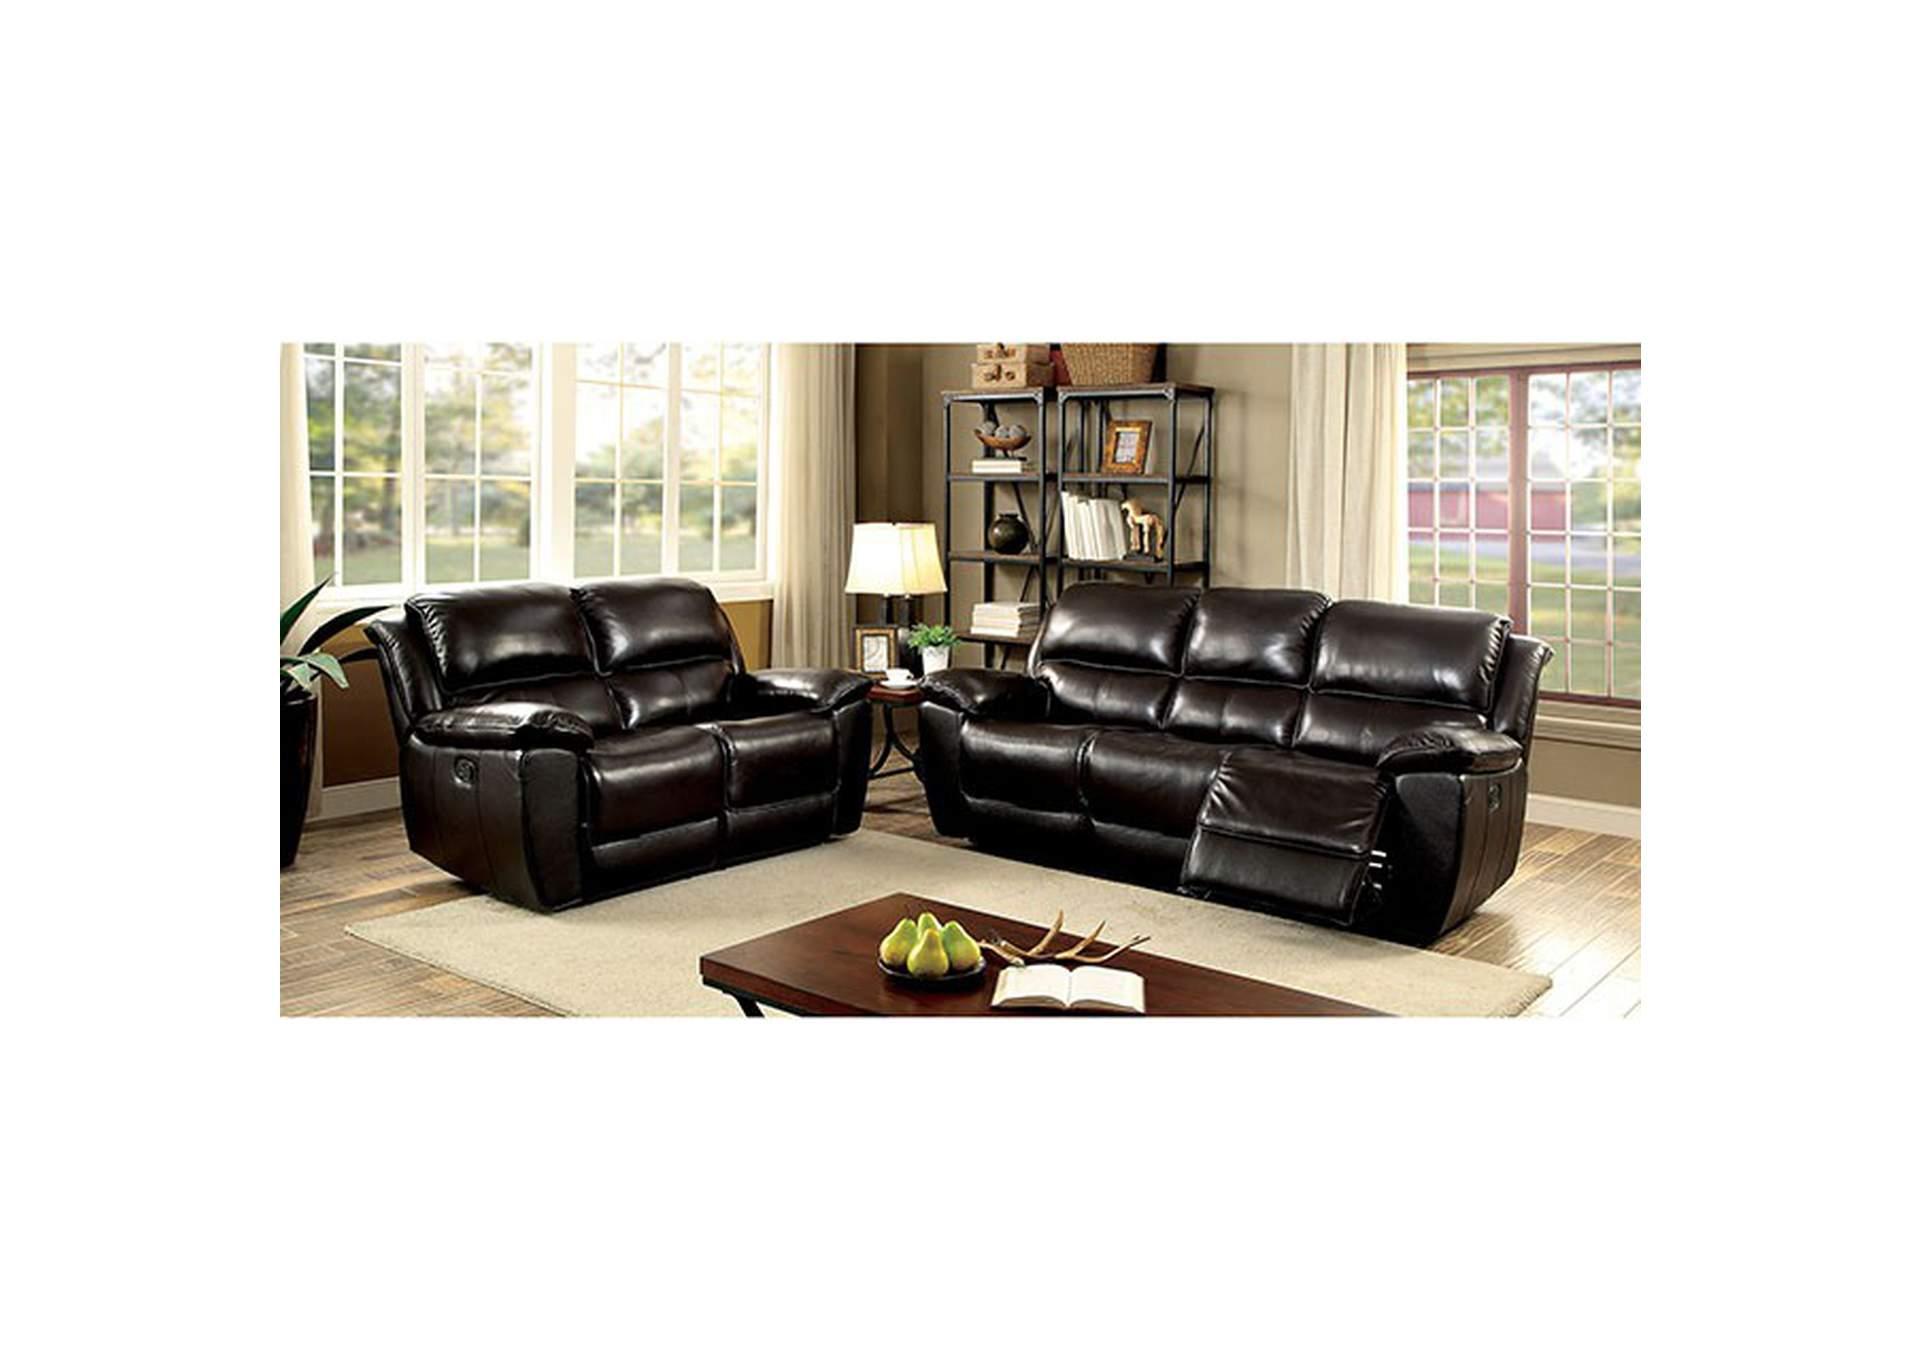 Dimensional Furniture Outlet Keara Dark Brown Sofa And Loveseat W 4